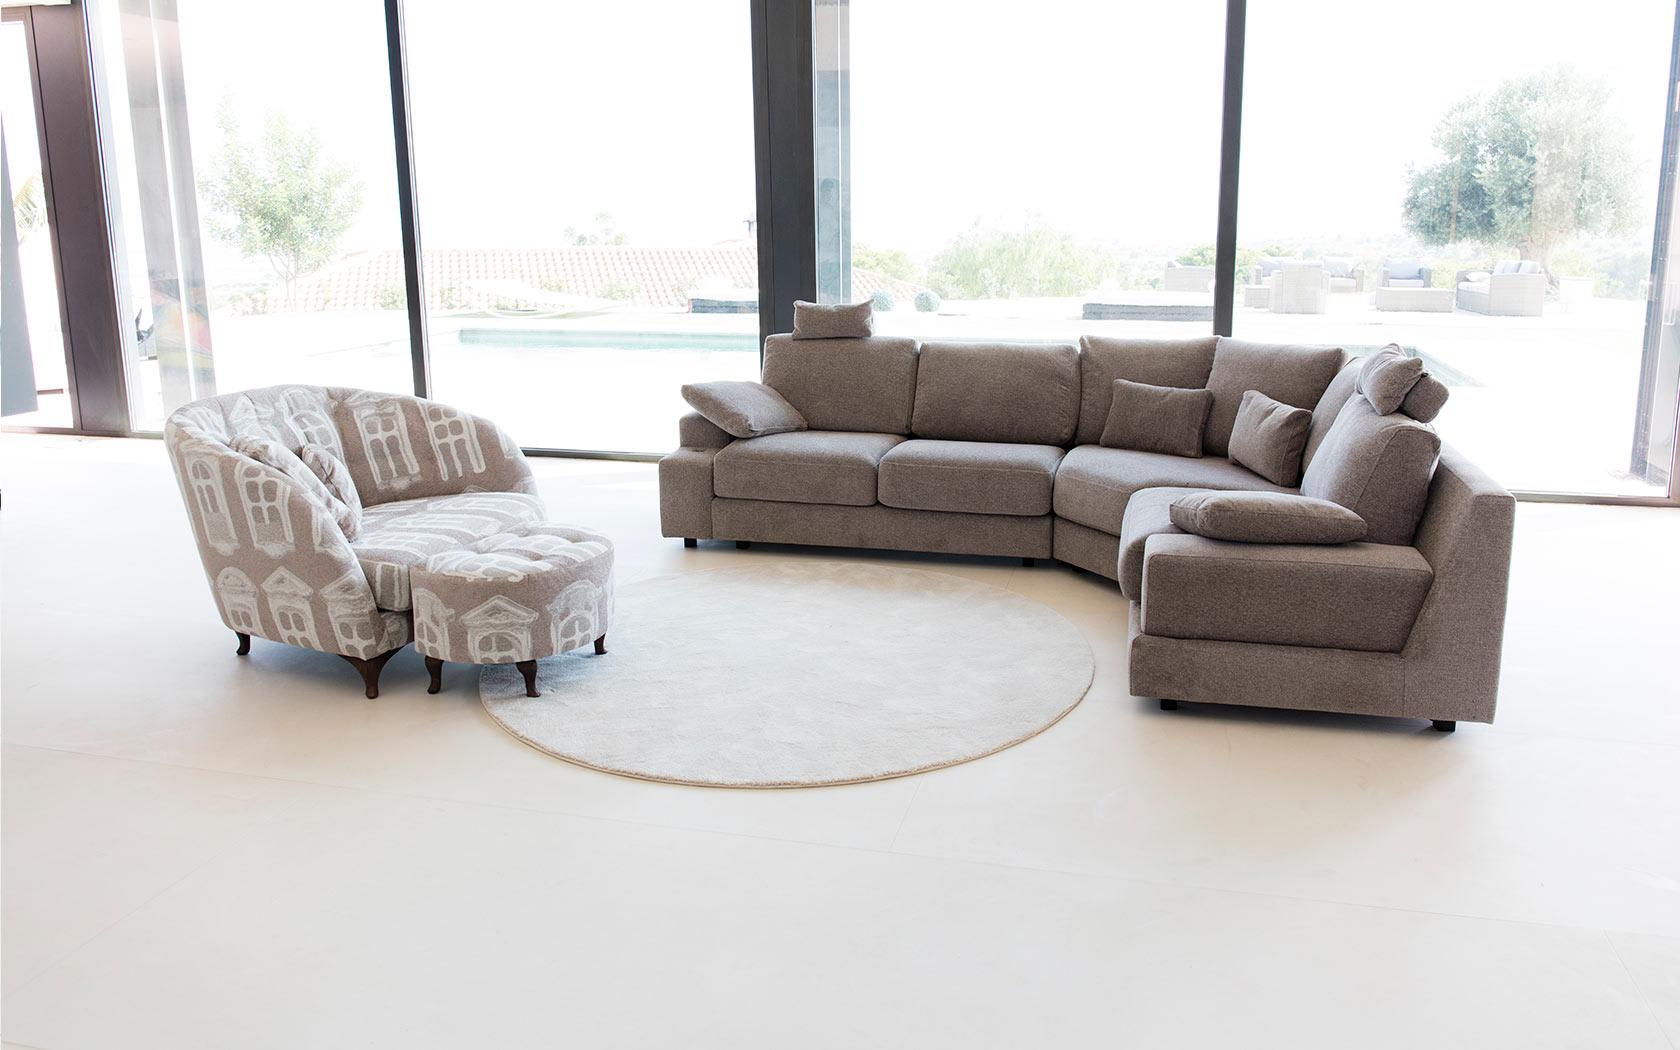 Calessi sofa Fama 2019 01